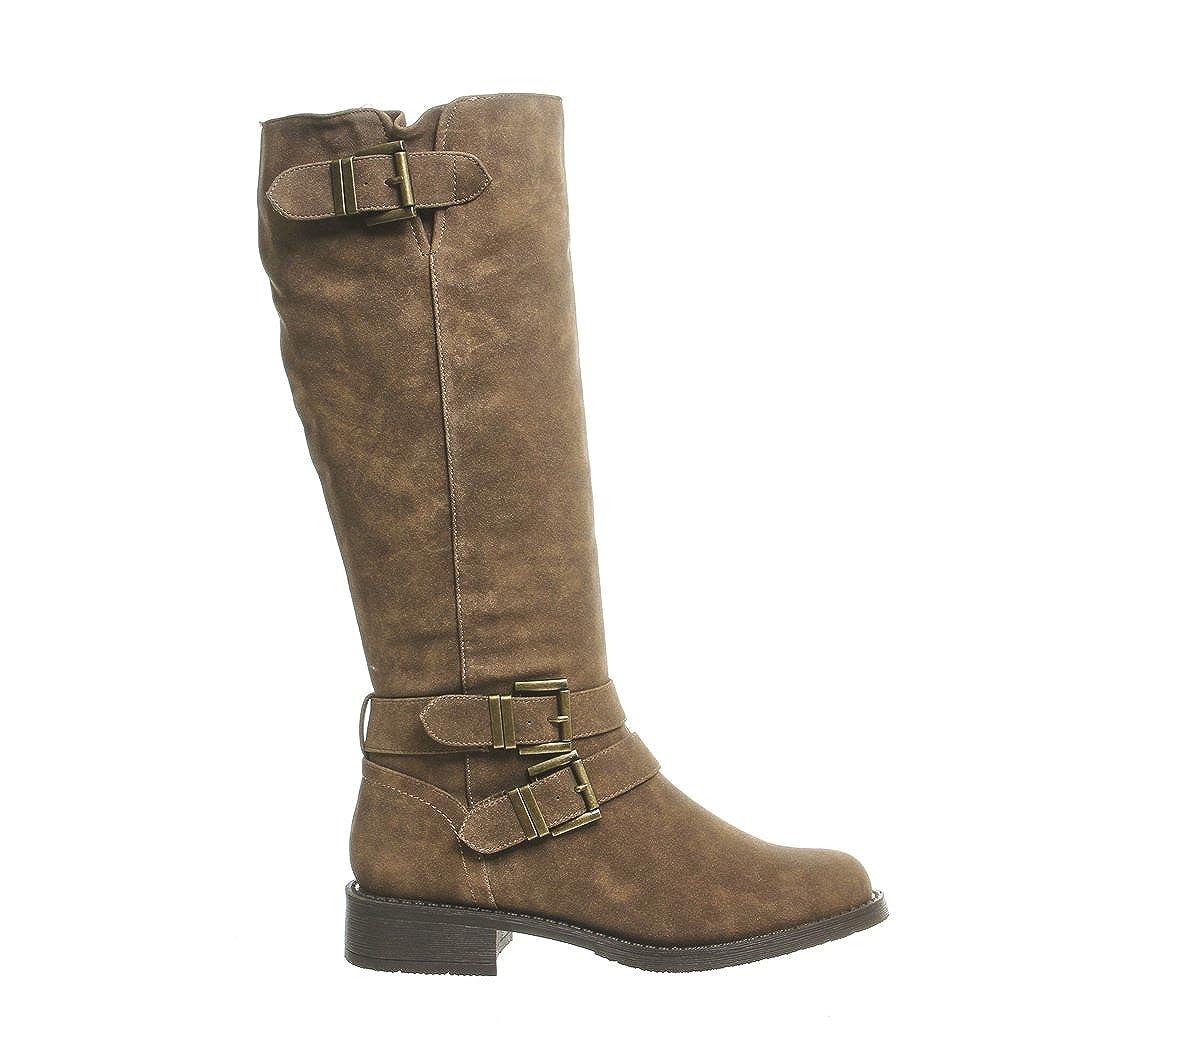 1f958ce994 Office Kiddo Buckle Biker Boot Brown Fur Lined - 4 UK  Amazon.co.uk  Shoes    Bags